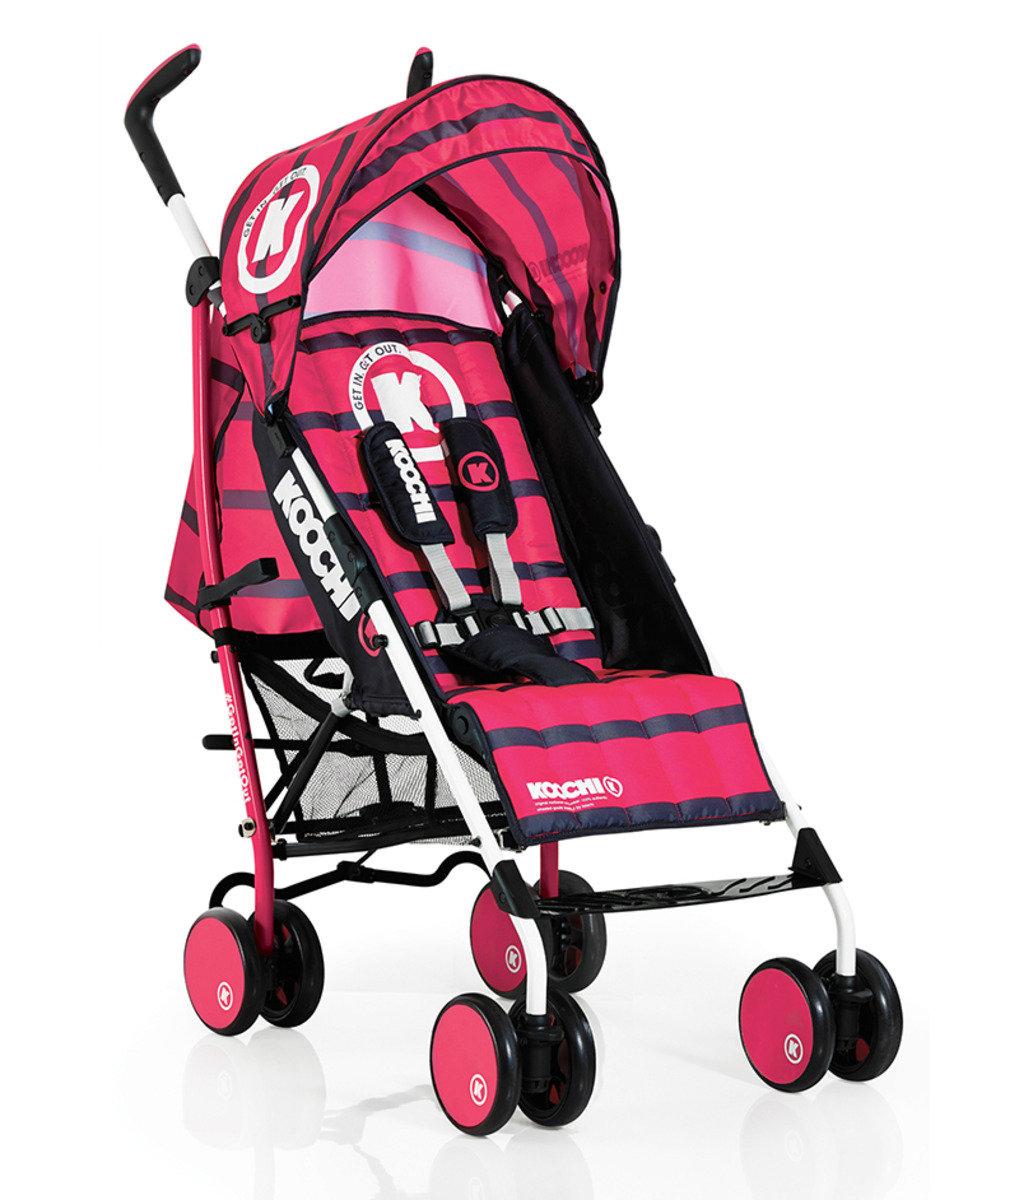 英國 Koochi Sneaker 嬰兒手推車 - Mix Magenta